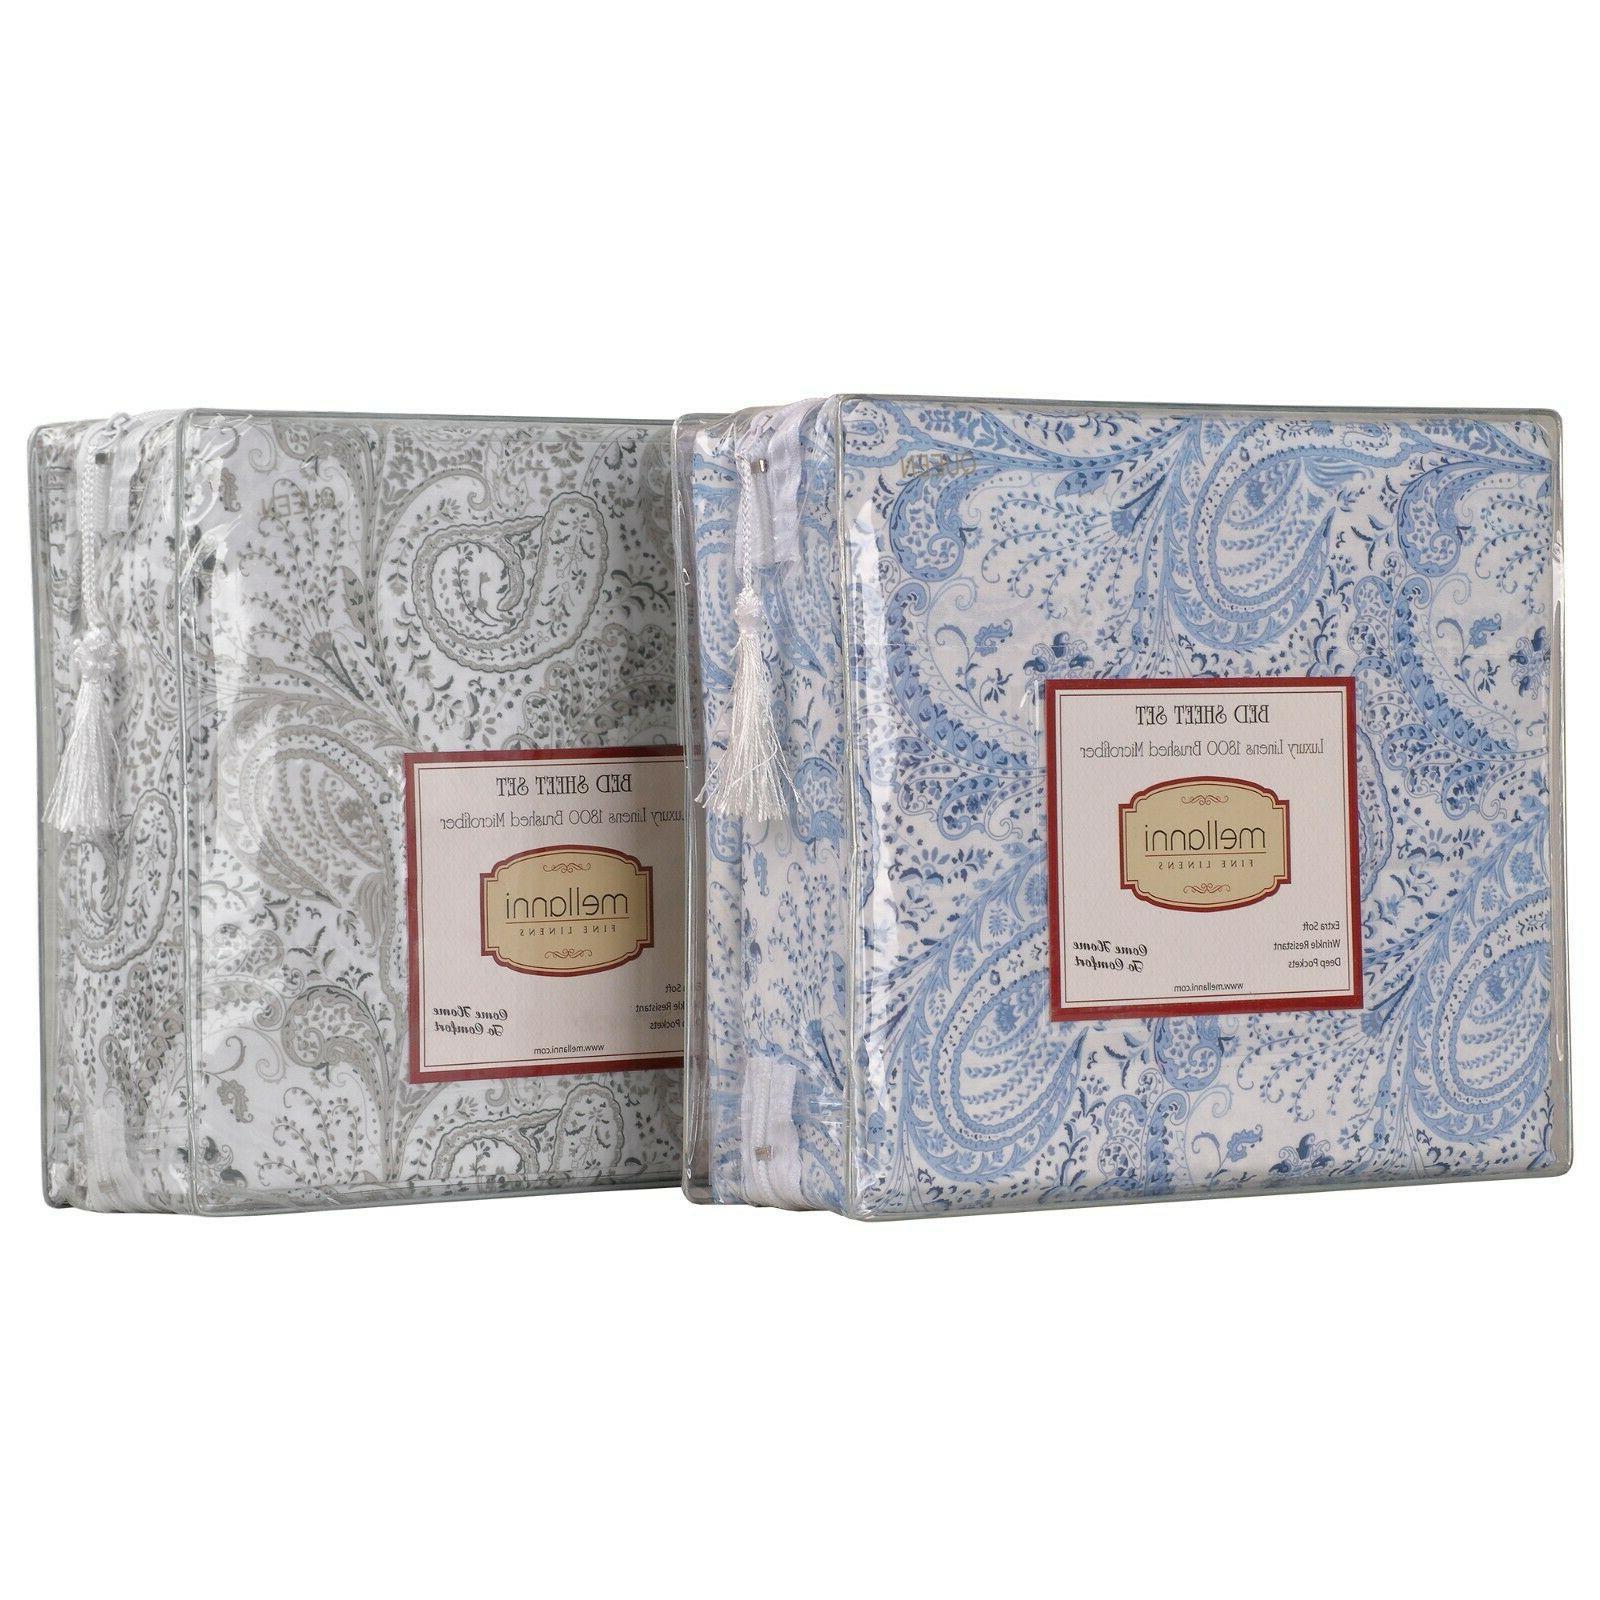 Mellanni Bed Sheet Set Paisley, Deep Pockets 1800 Collection Microfiber